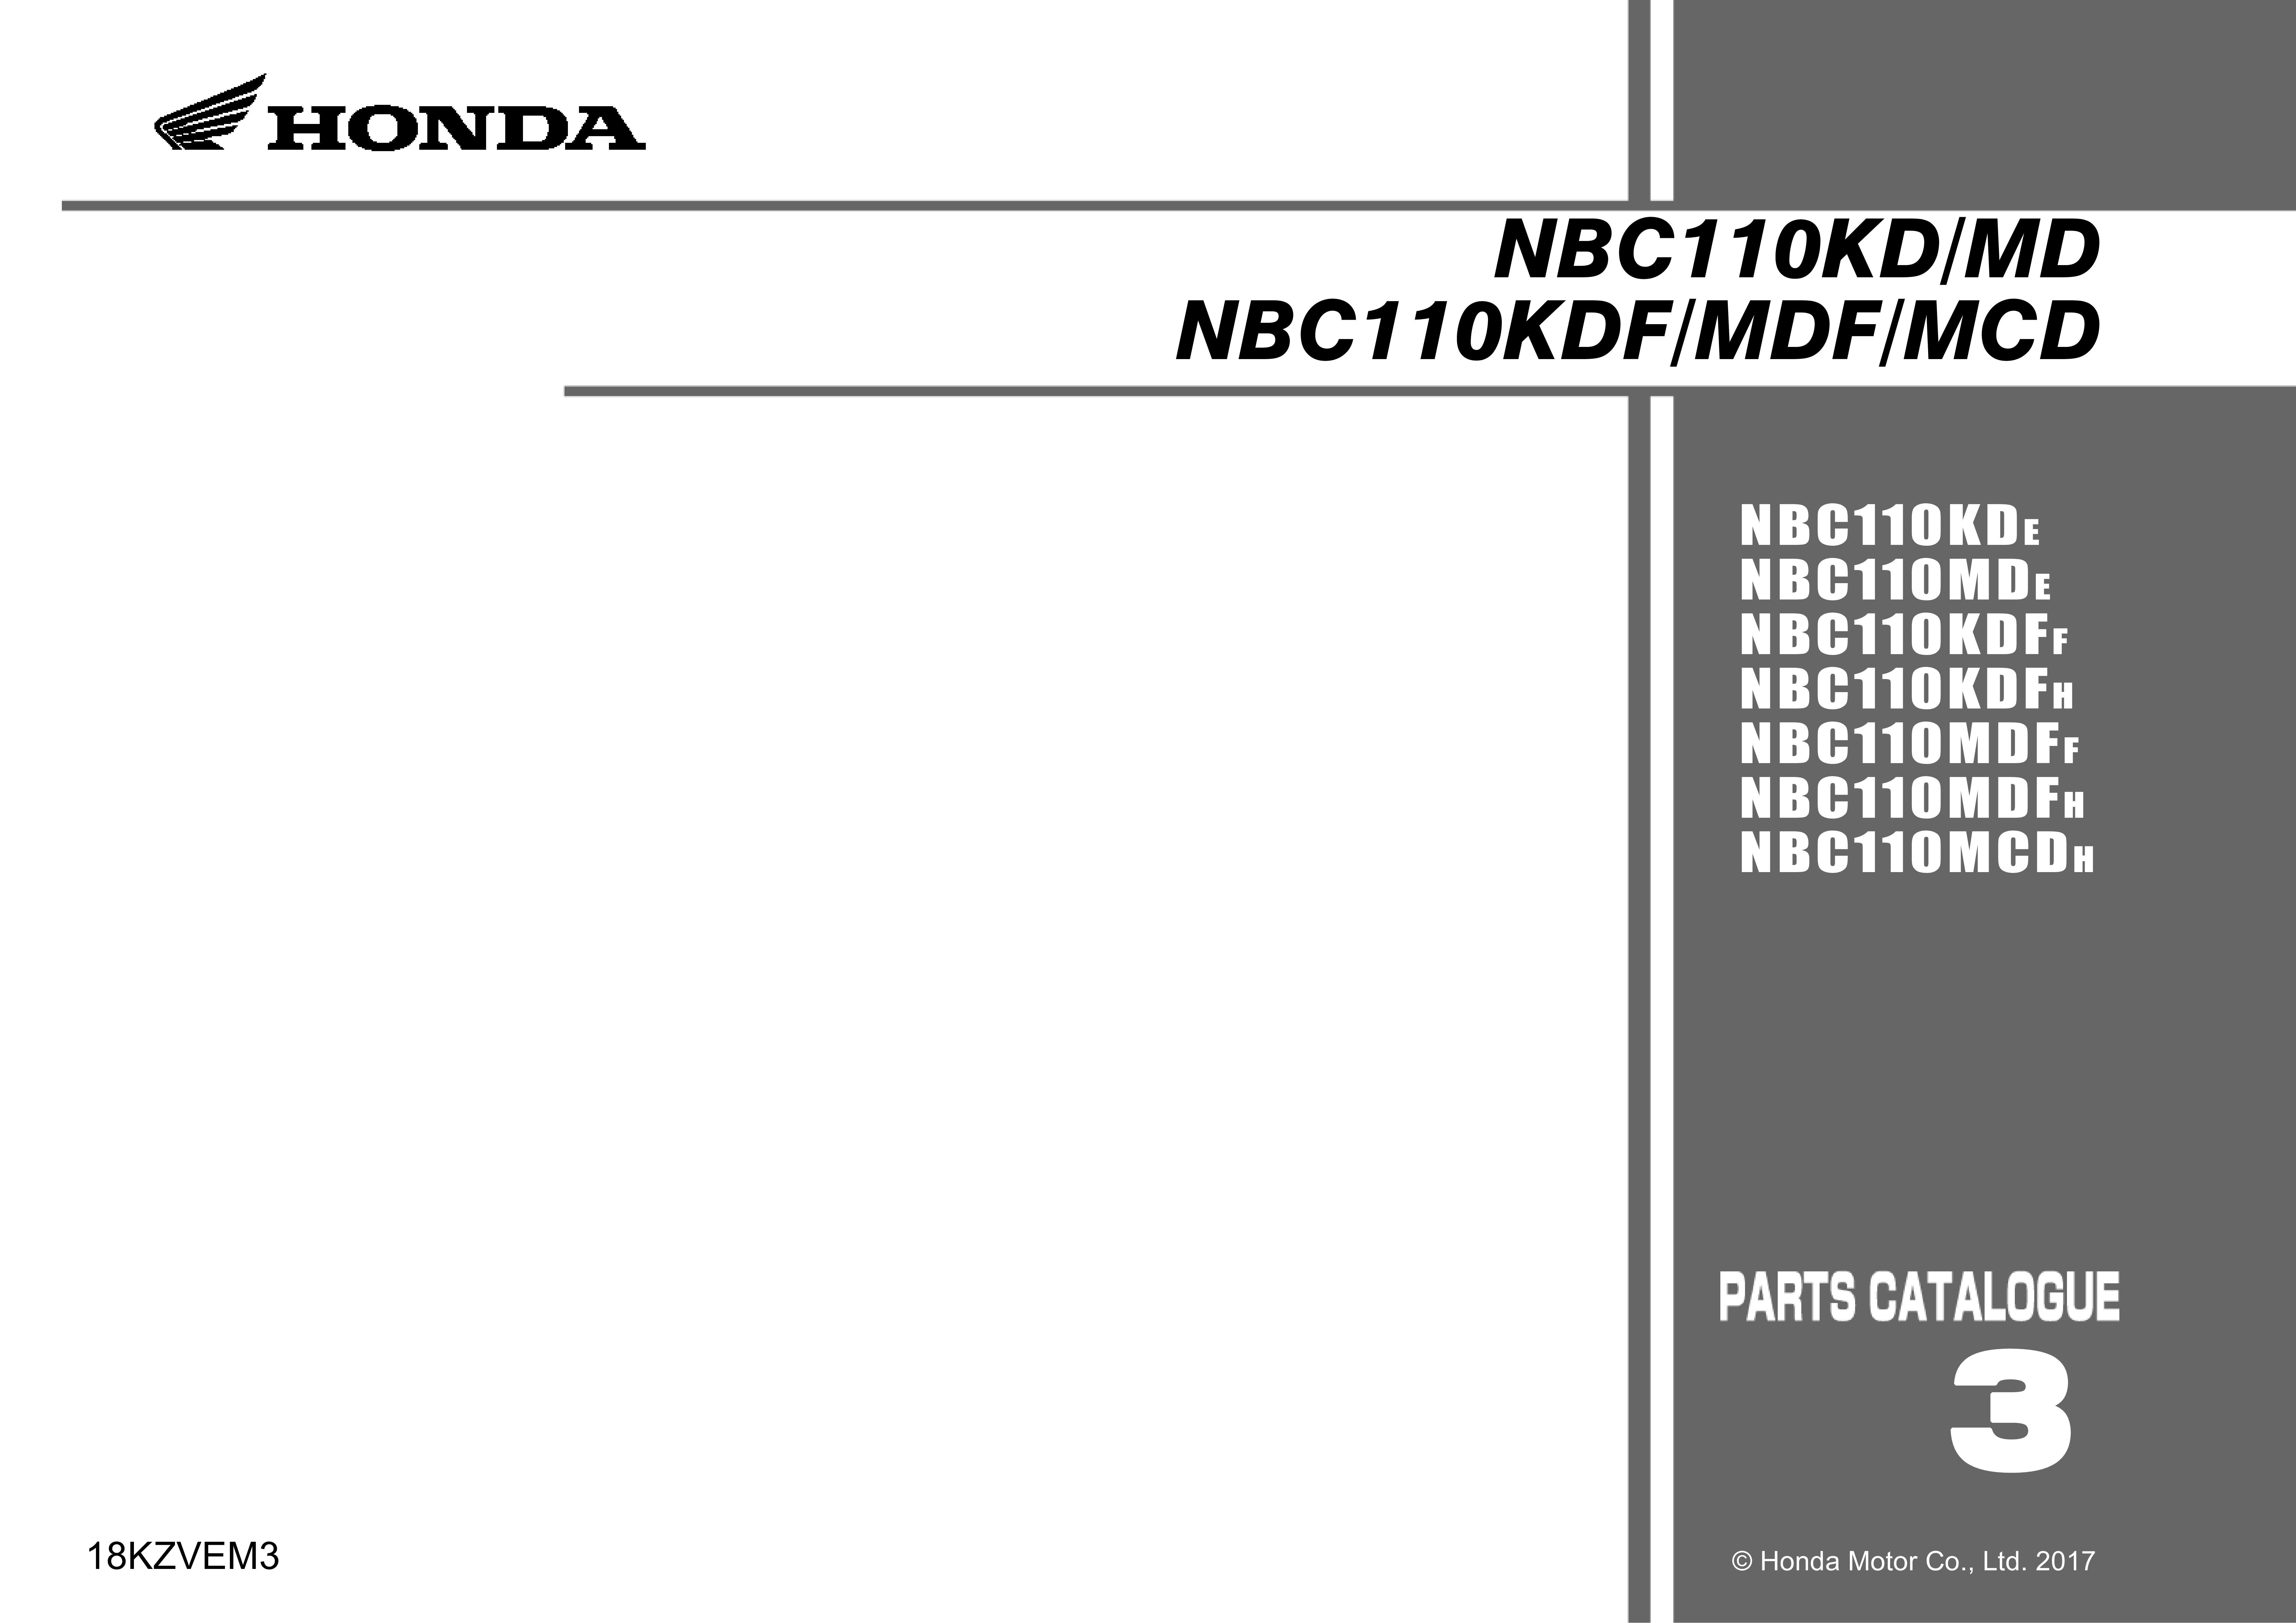 Parts List for Honda NBC110KD Dream 110 (2017)